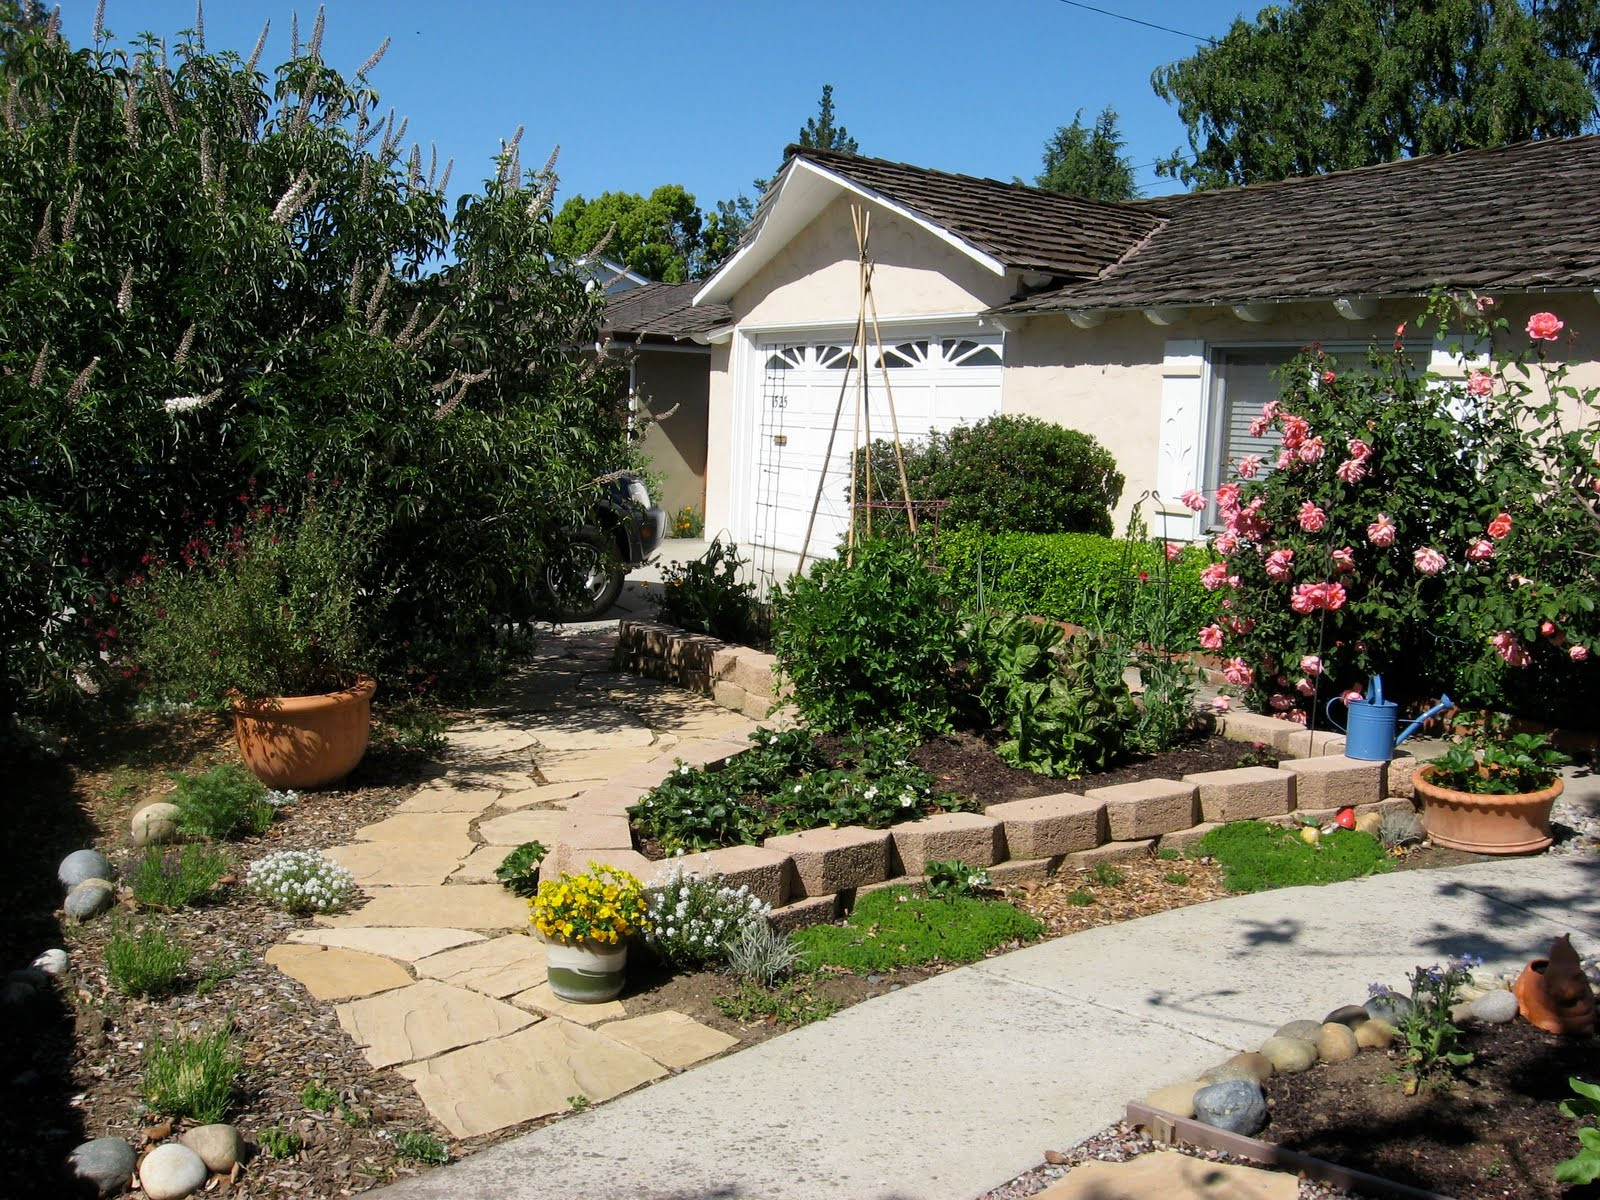 urban artichoke transform your garden transform your life